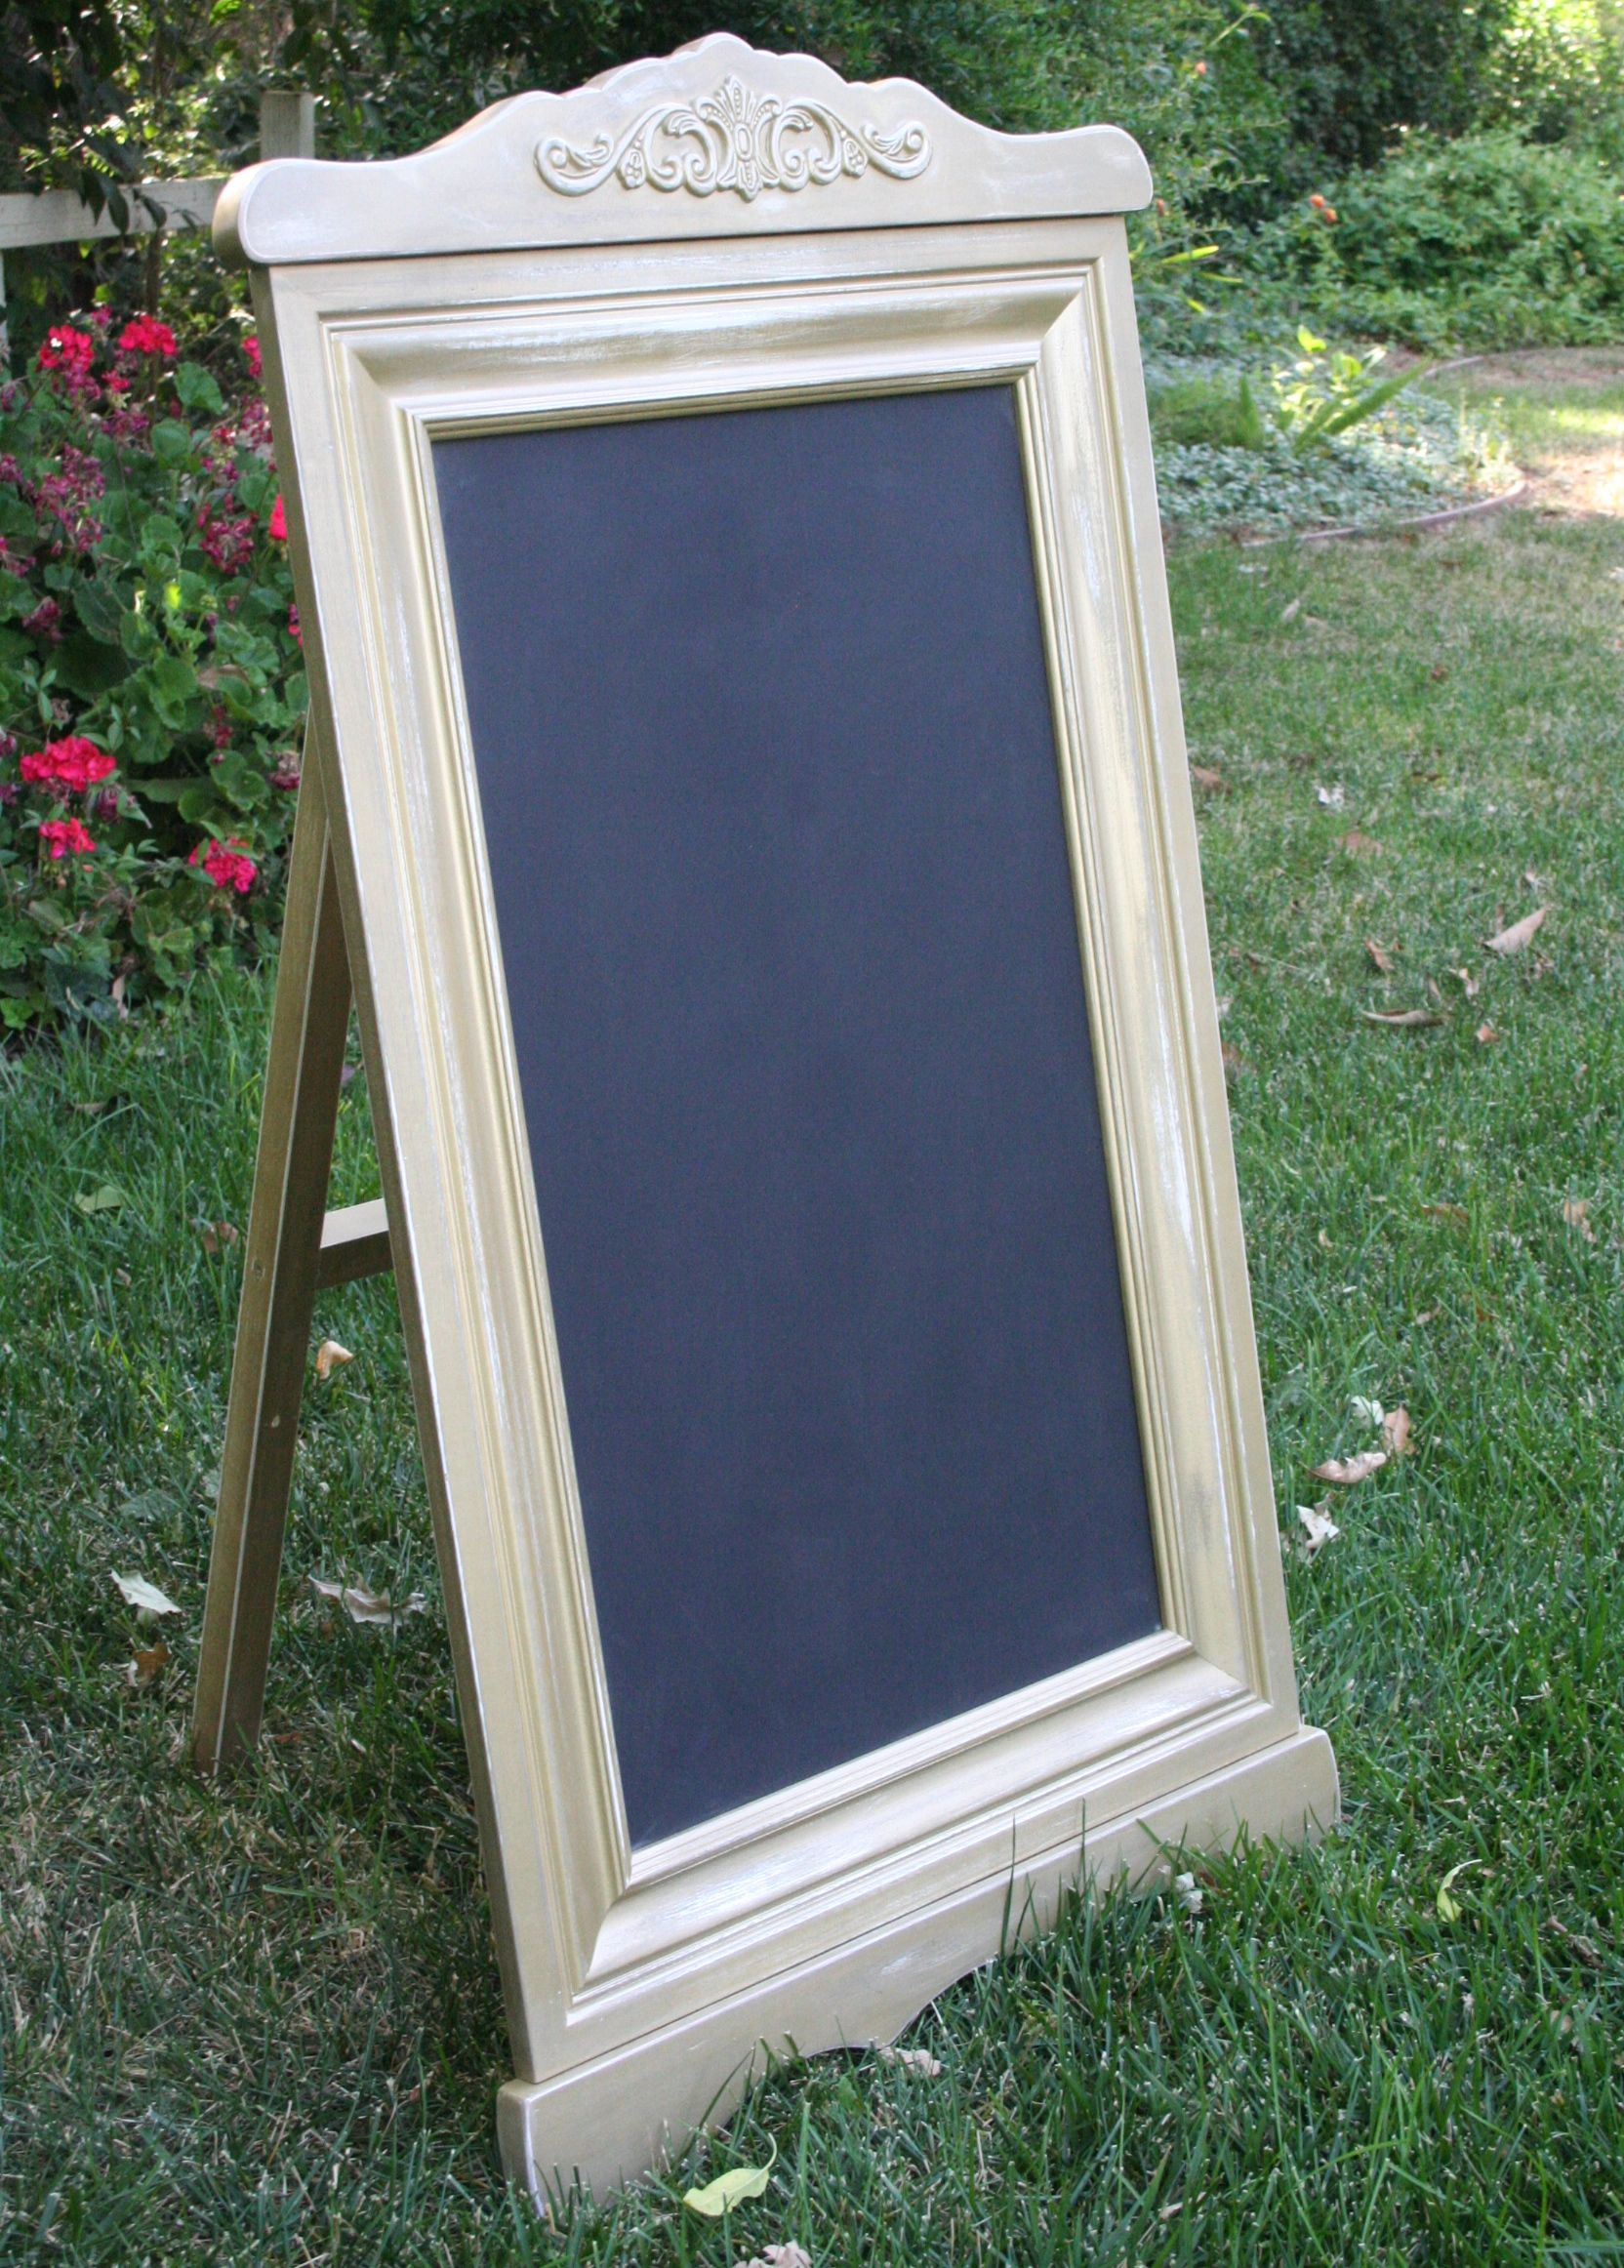 chalk sandwich board sign custom built to order one or double sided vintage inspired. Black Bedroom Furniture Sets. Home Design Ideas